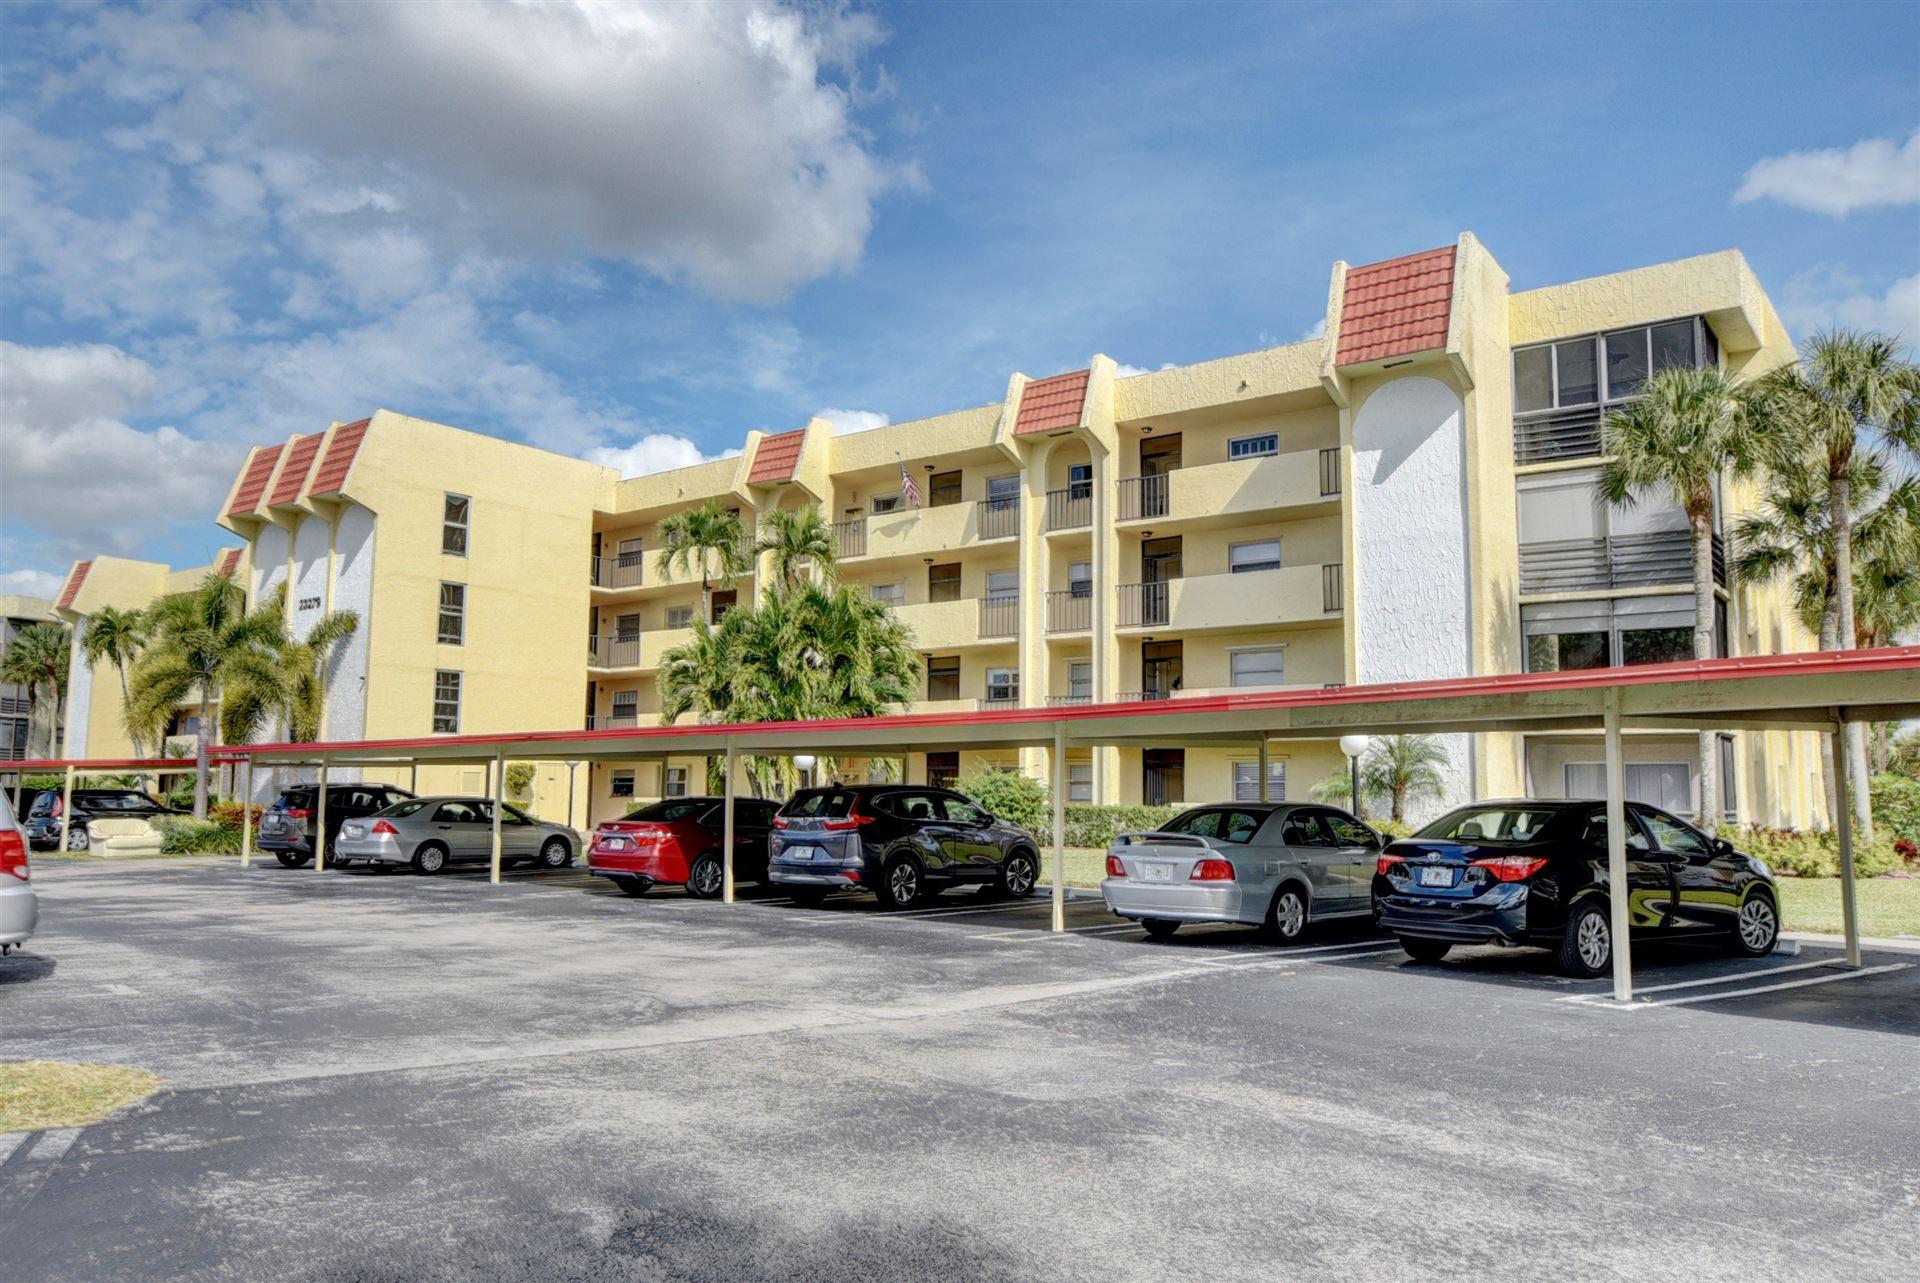 23279 Barwood Lane N #101, Boca Raton, FL 33428 - #: RX-10684240